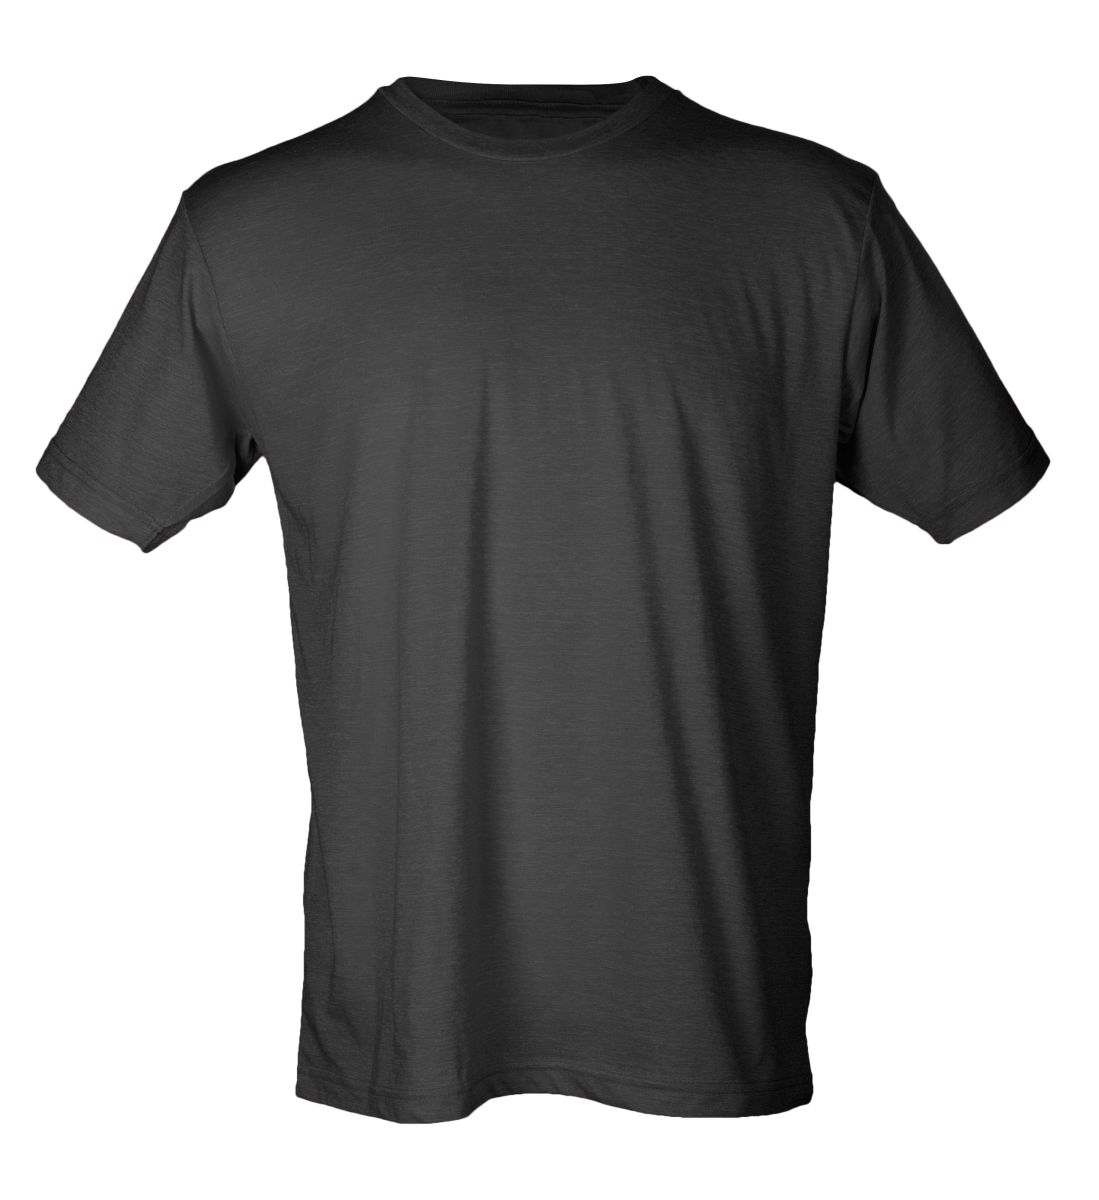 Black t shirt unisex - Heather Athletic Blue Black